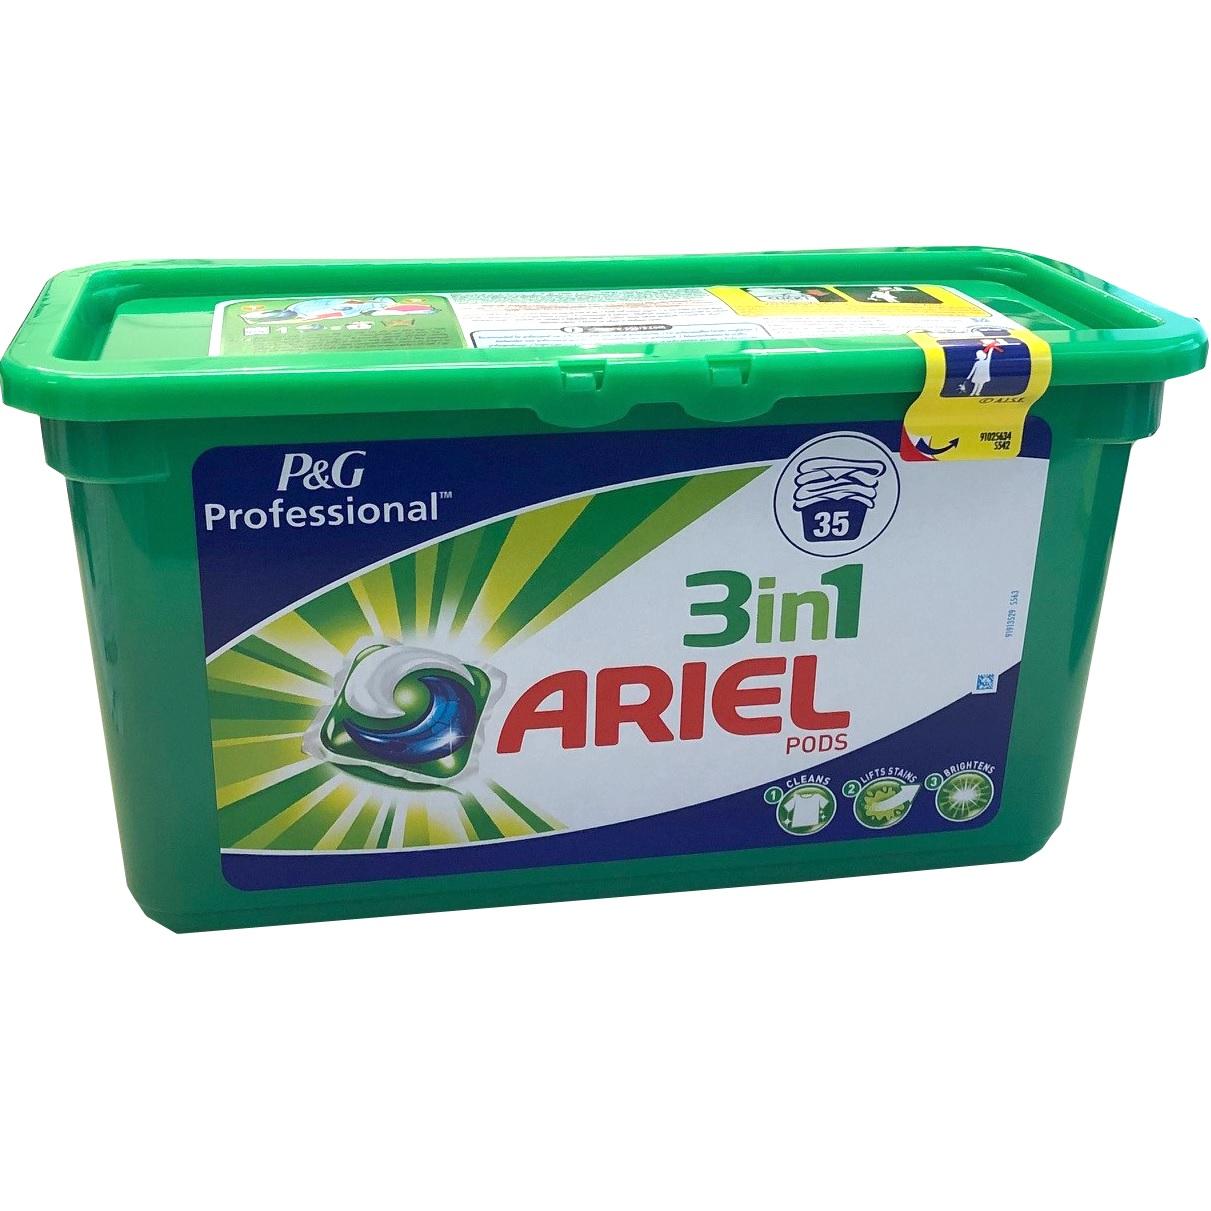 Ariel-3in1-Liquitabs-Bio-Laundry-Gel--pack-of-35-